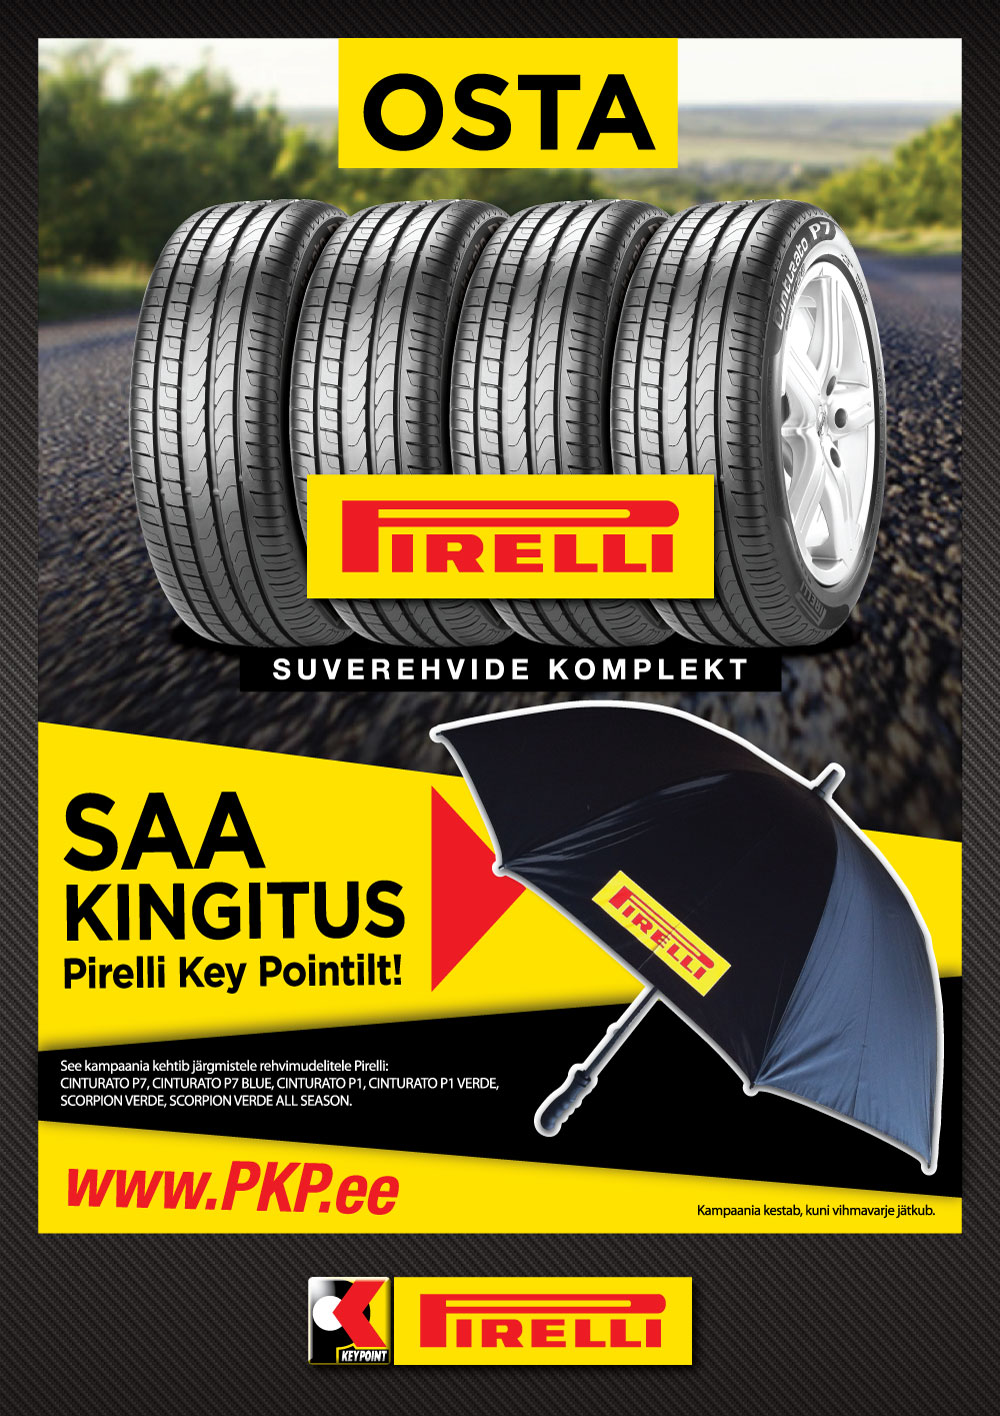 Osta Pirelli, saa kingitus Pirelli Key Pointilt!